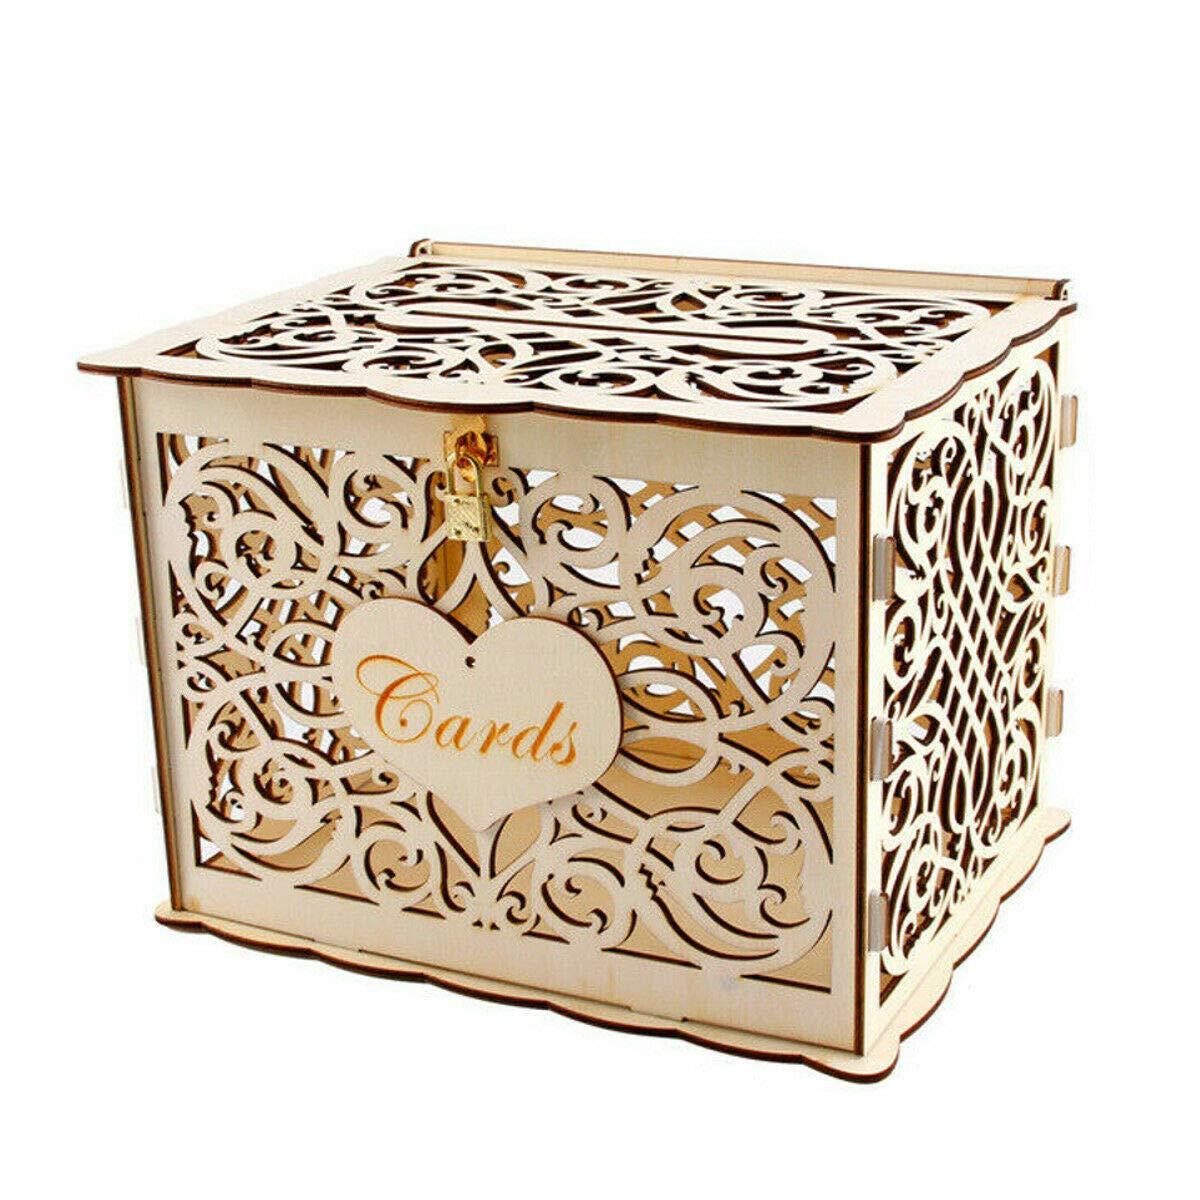 NITCHA14 Wooden Card Box with Lock Rustic Wedding Card Storage Box Gift Card Holder Box